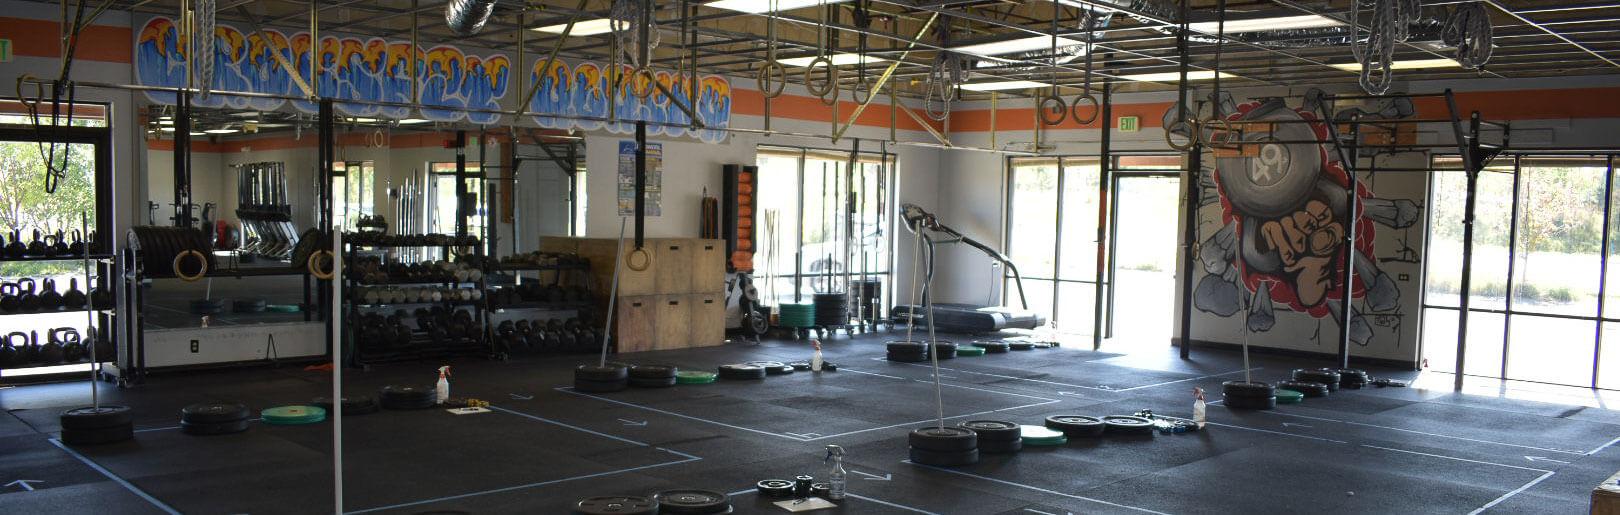 CrossFit Alaska gym